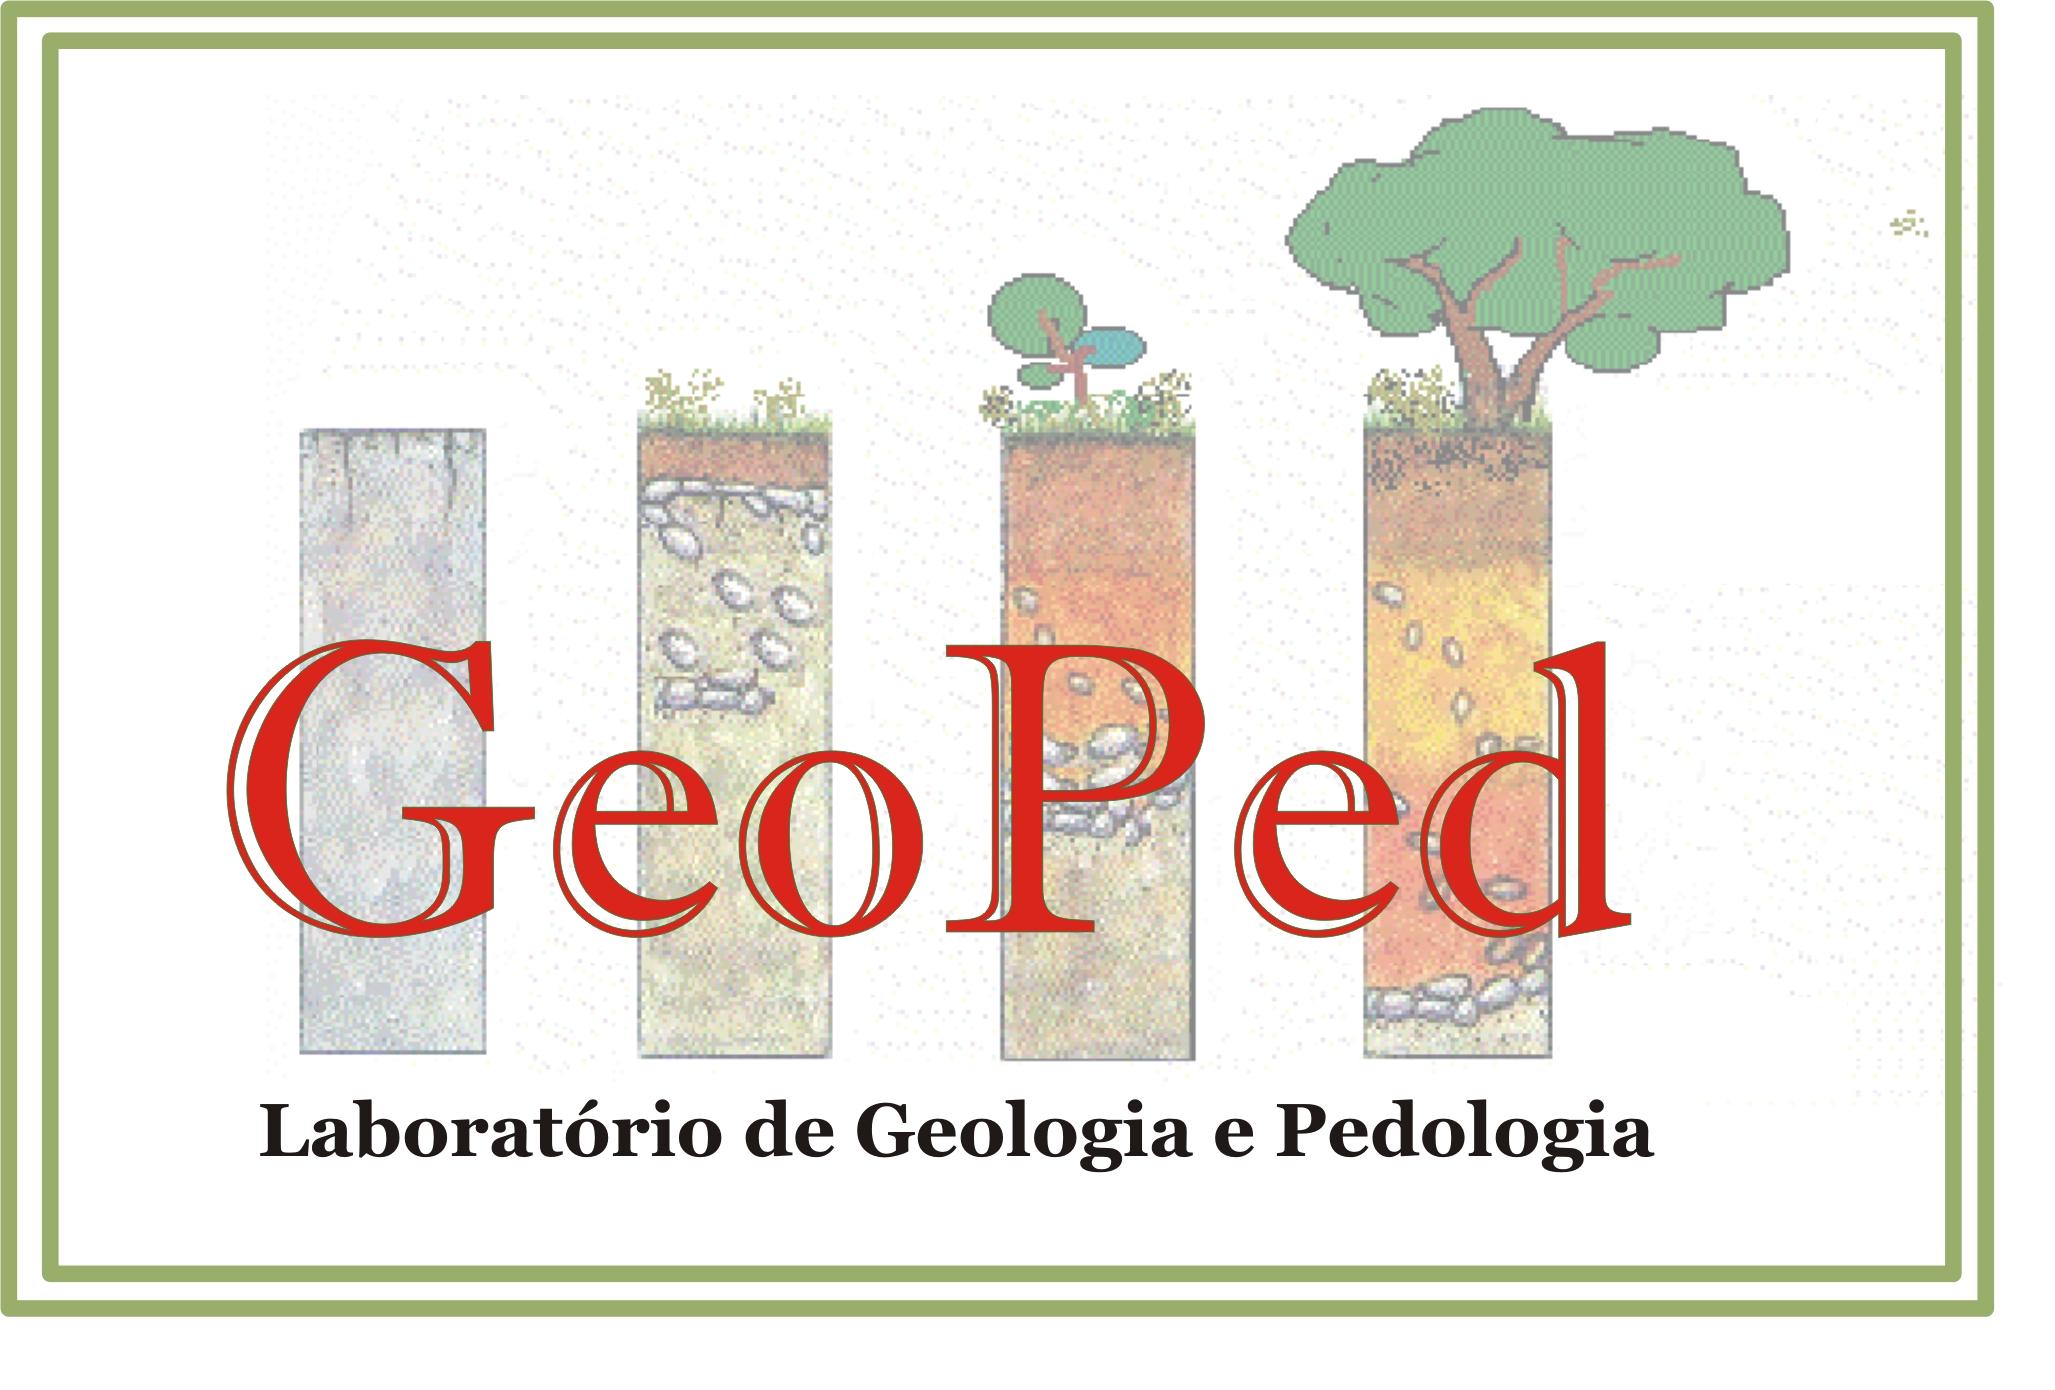 GEOPED